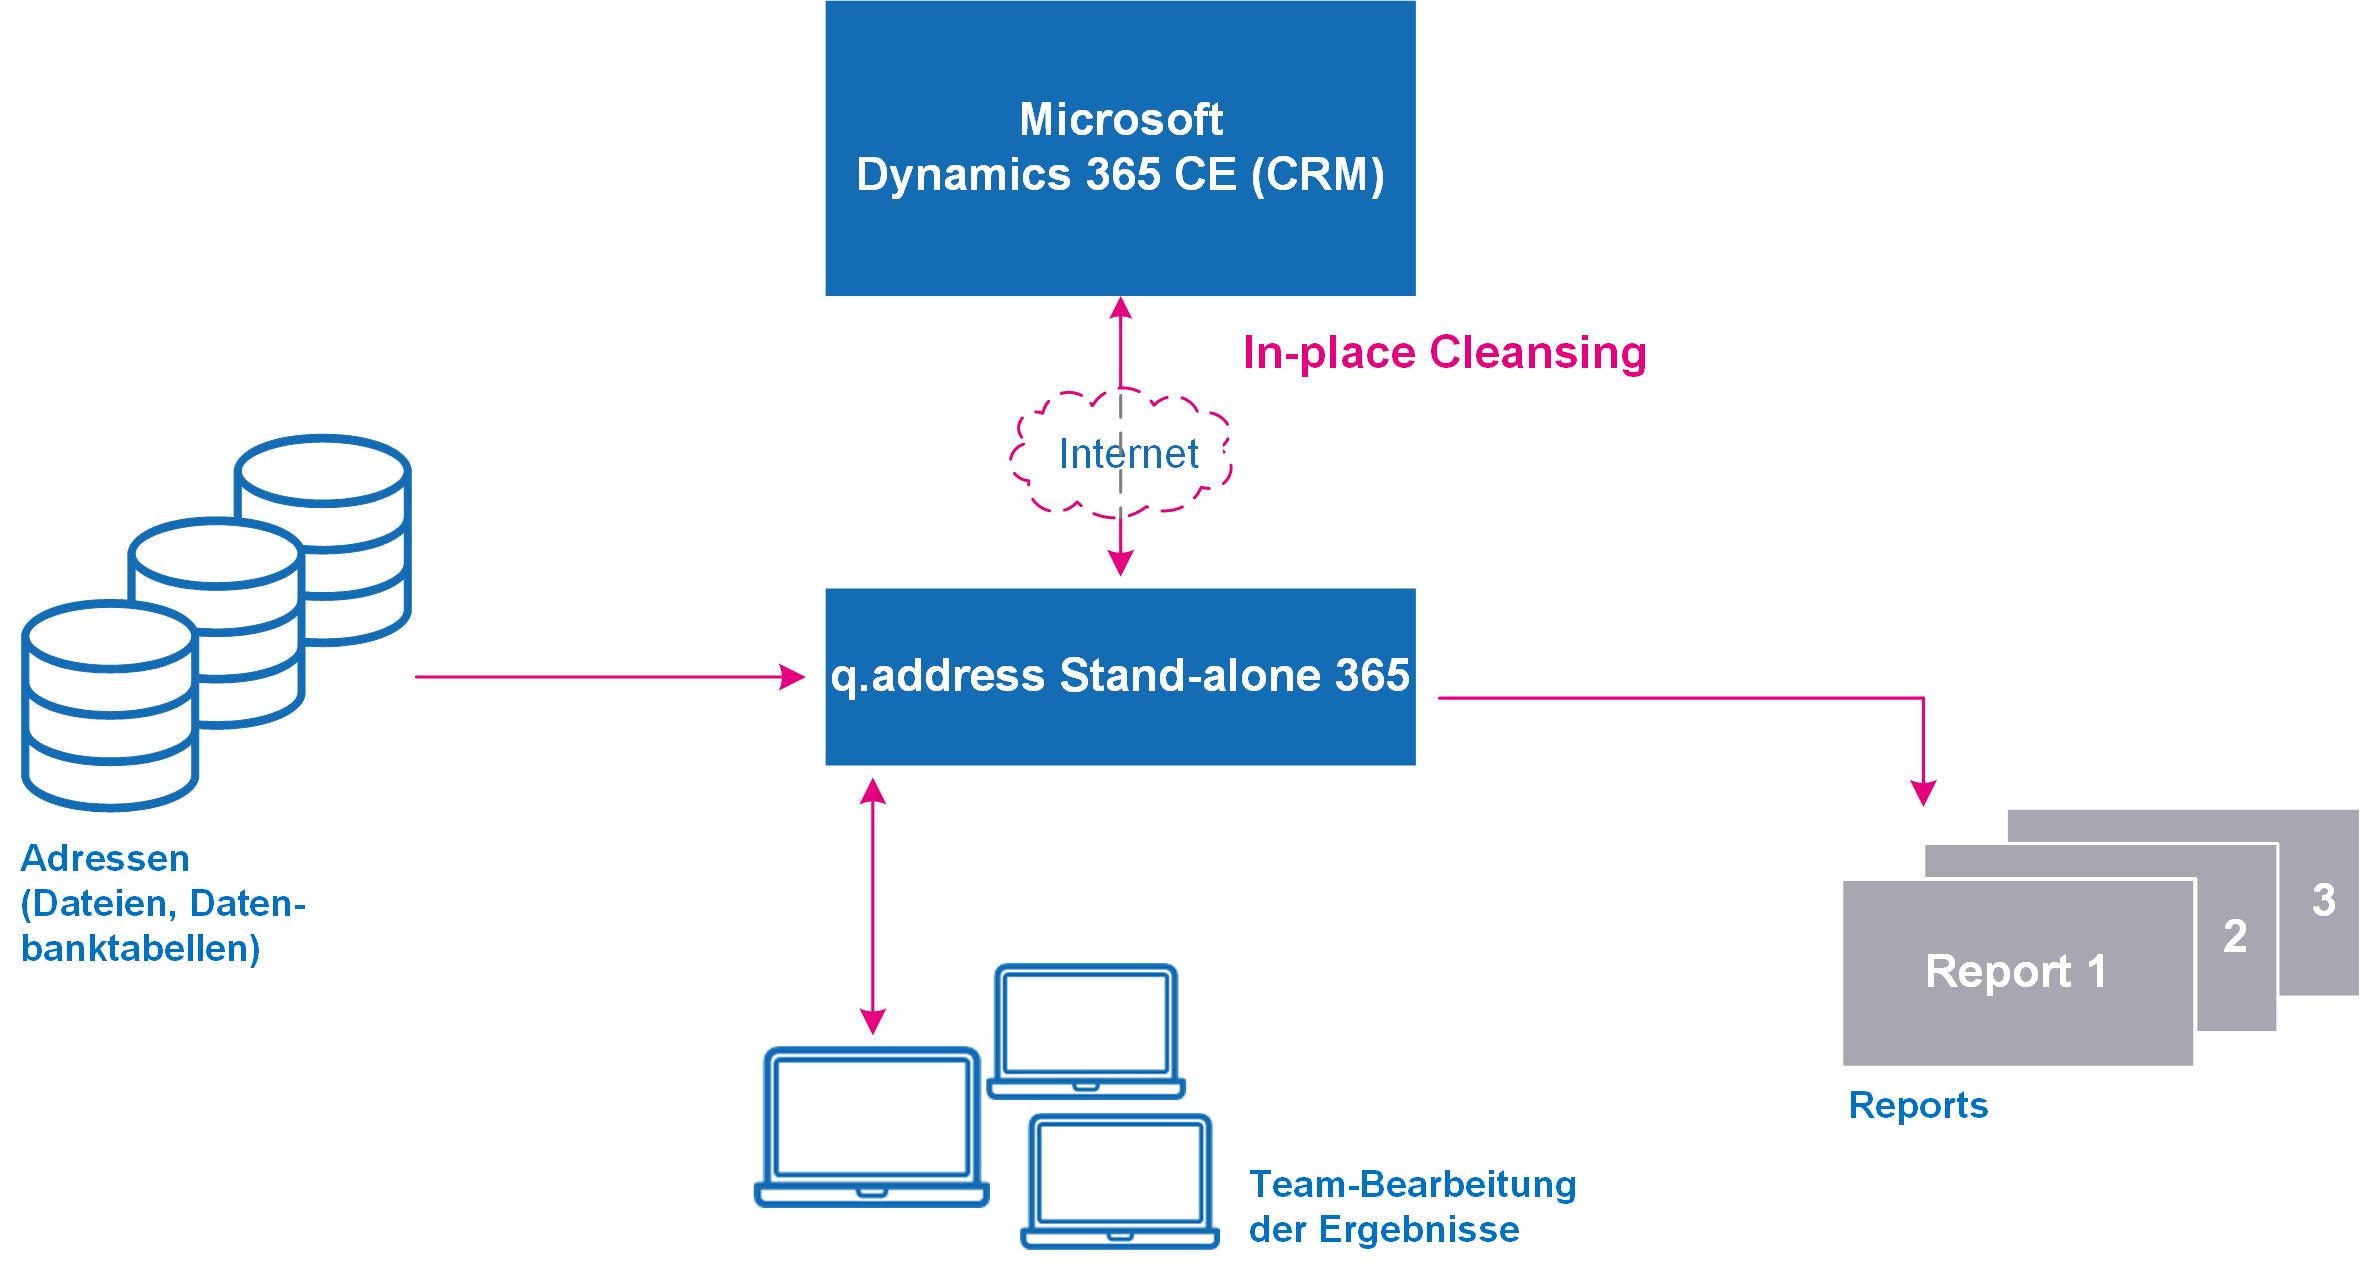 q.address Stand-alone für Microsoft Dynamics 365 CRM